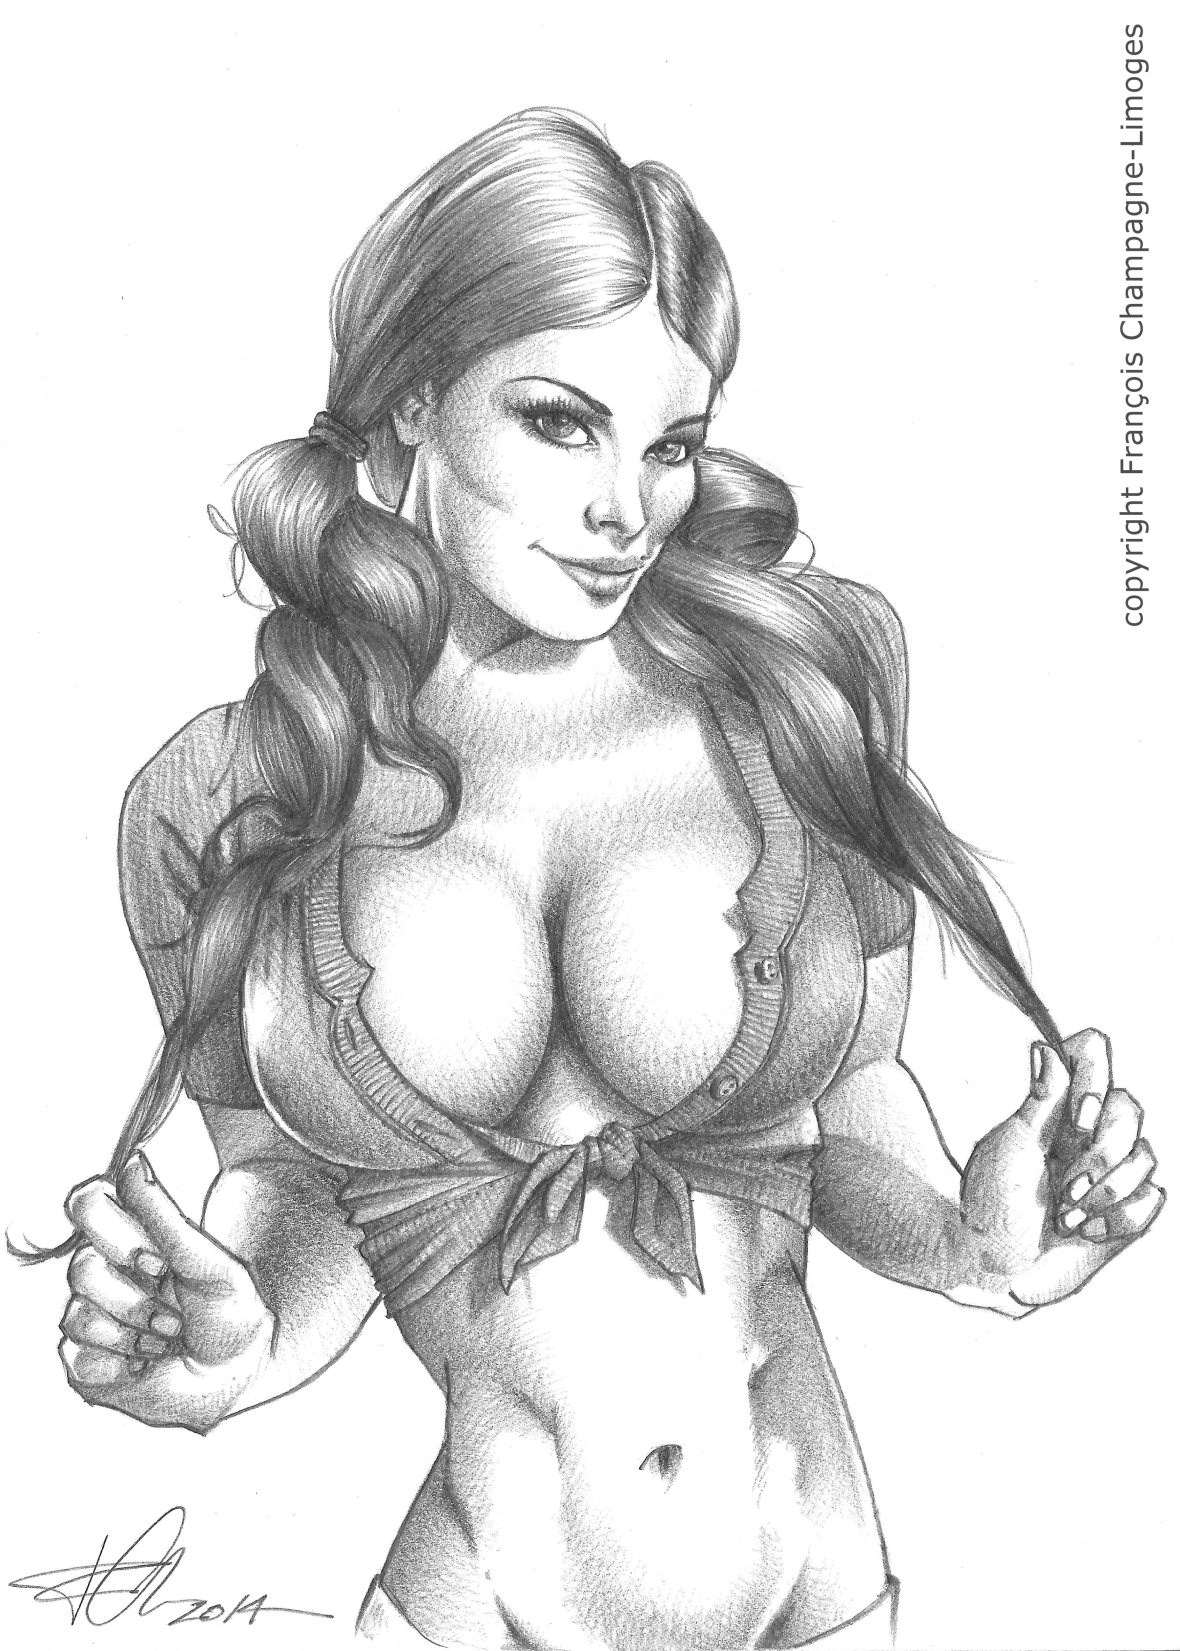 Sketch_600dpi (26)